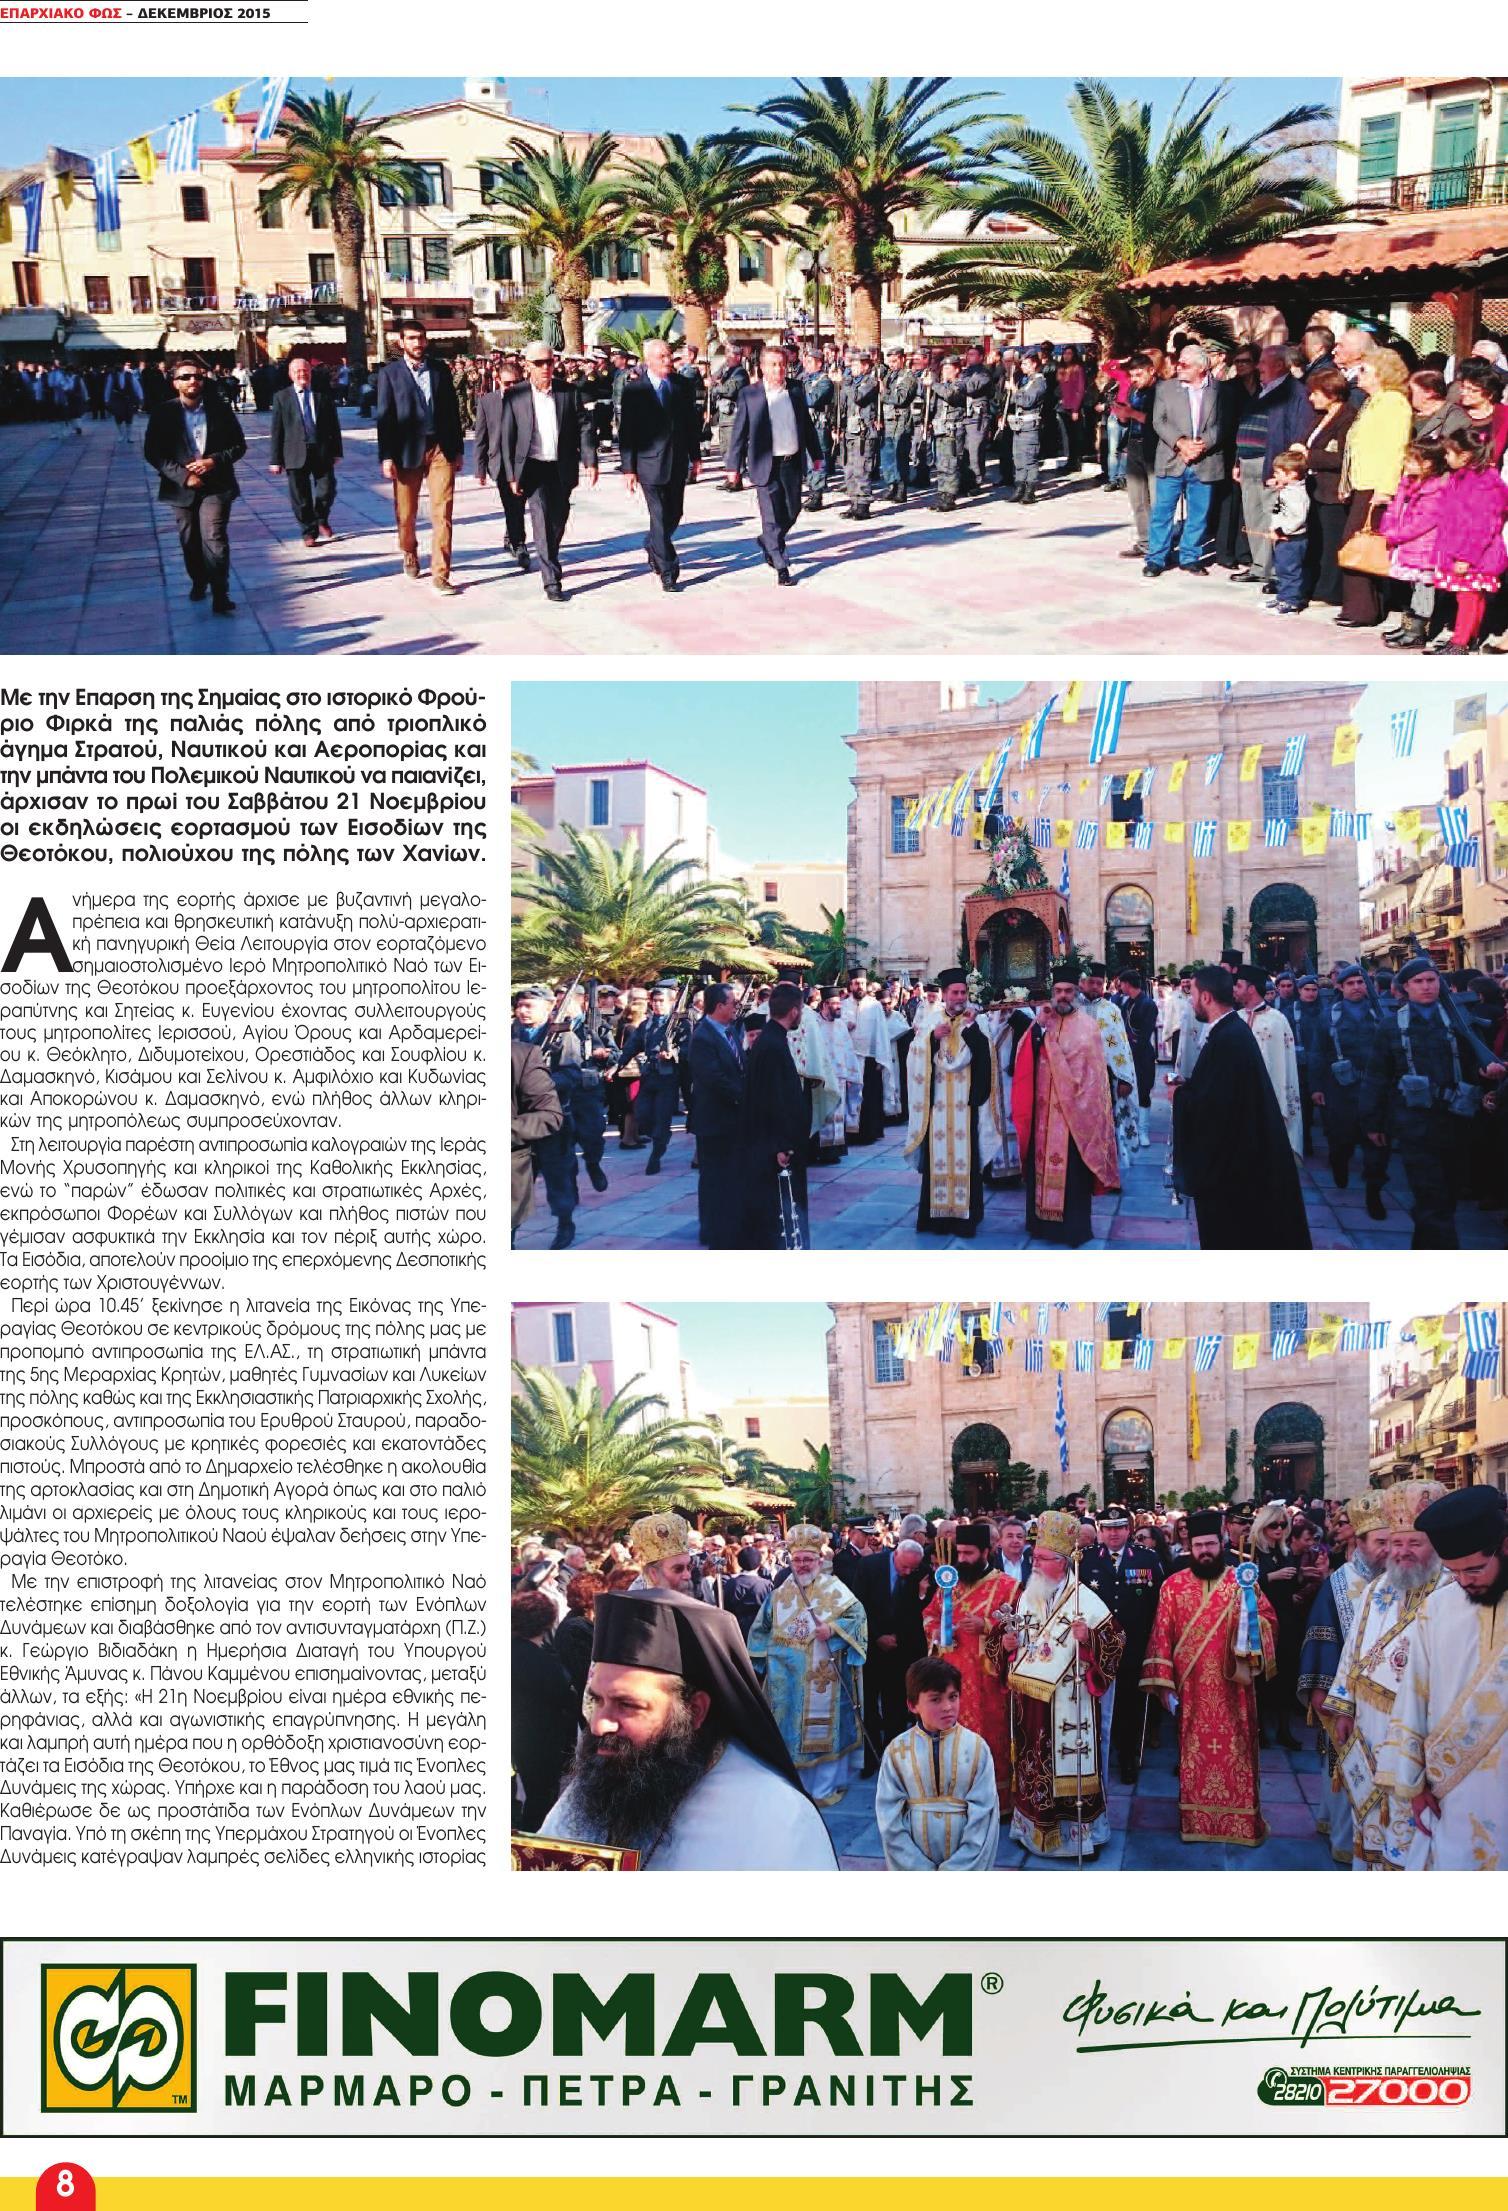 12 KAKANOS (Page 08)